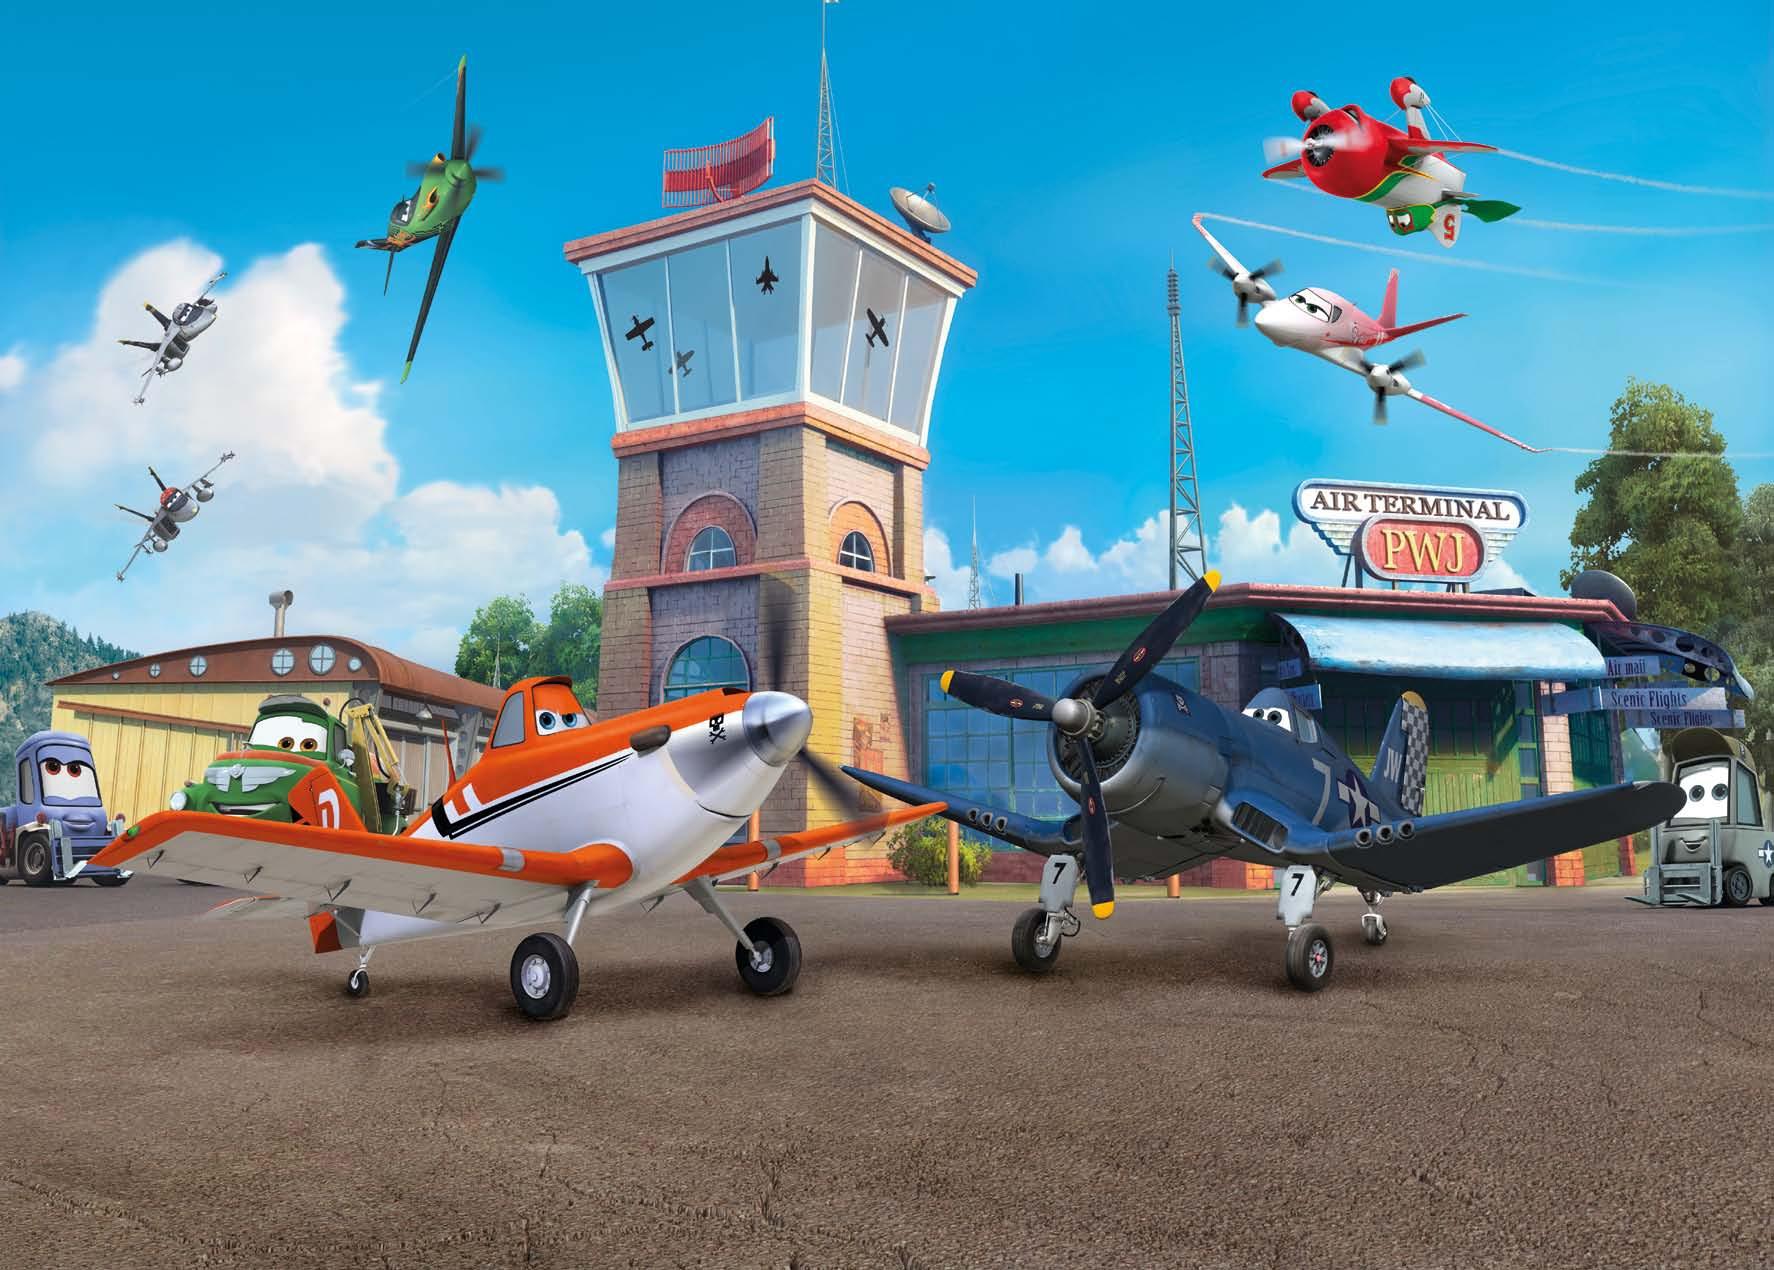 Poster XXL PLANES au terminal - Panoramique Disney - KOMAR